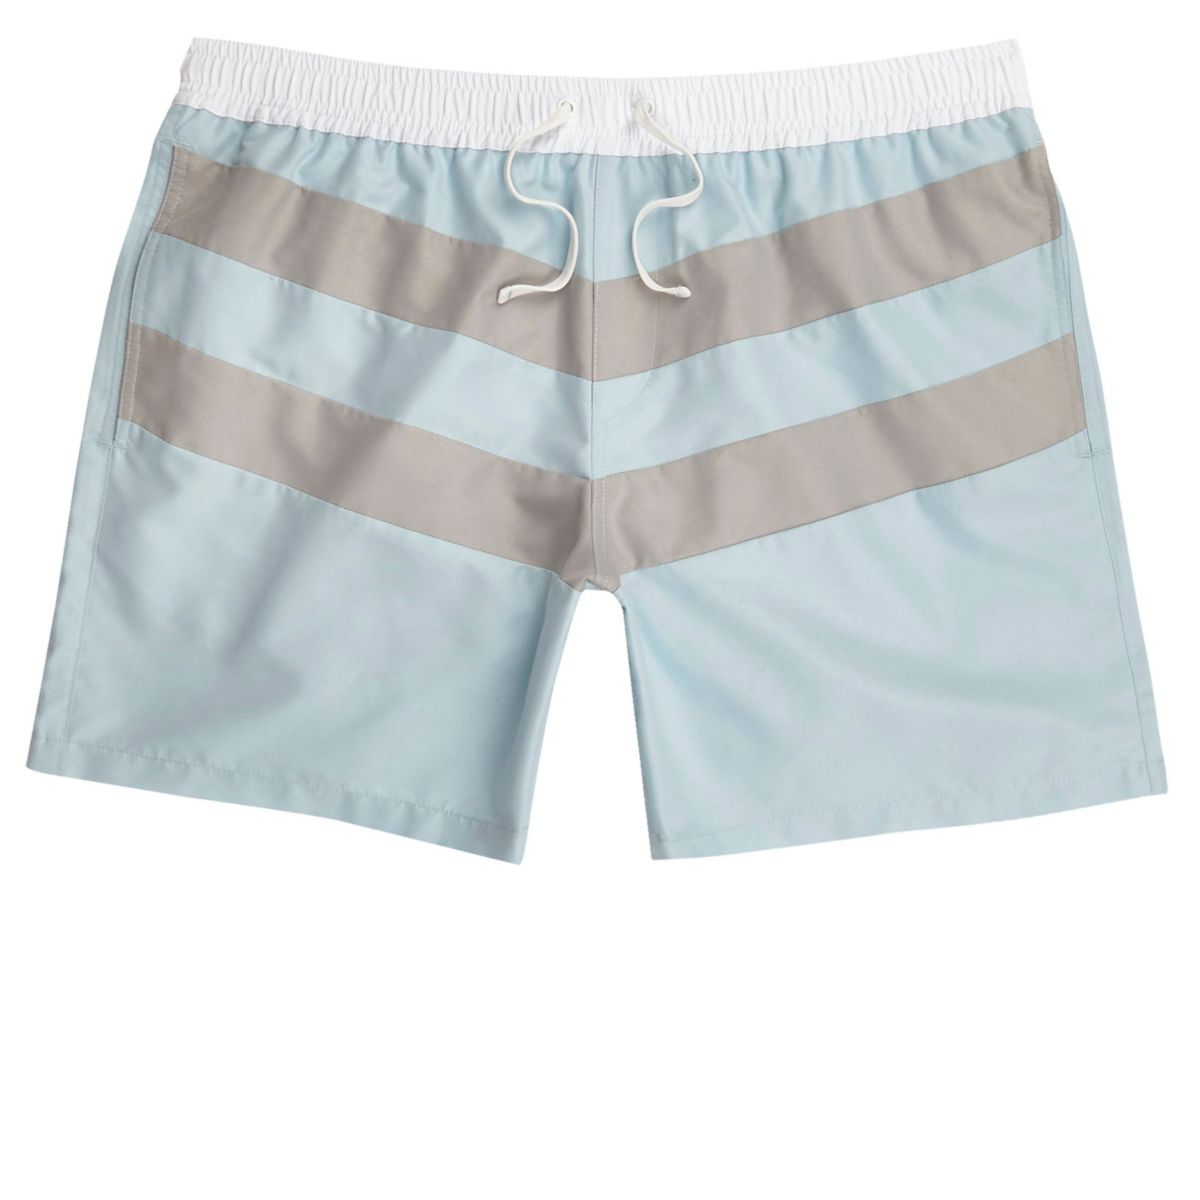 Light blue block stripe swim trunks